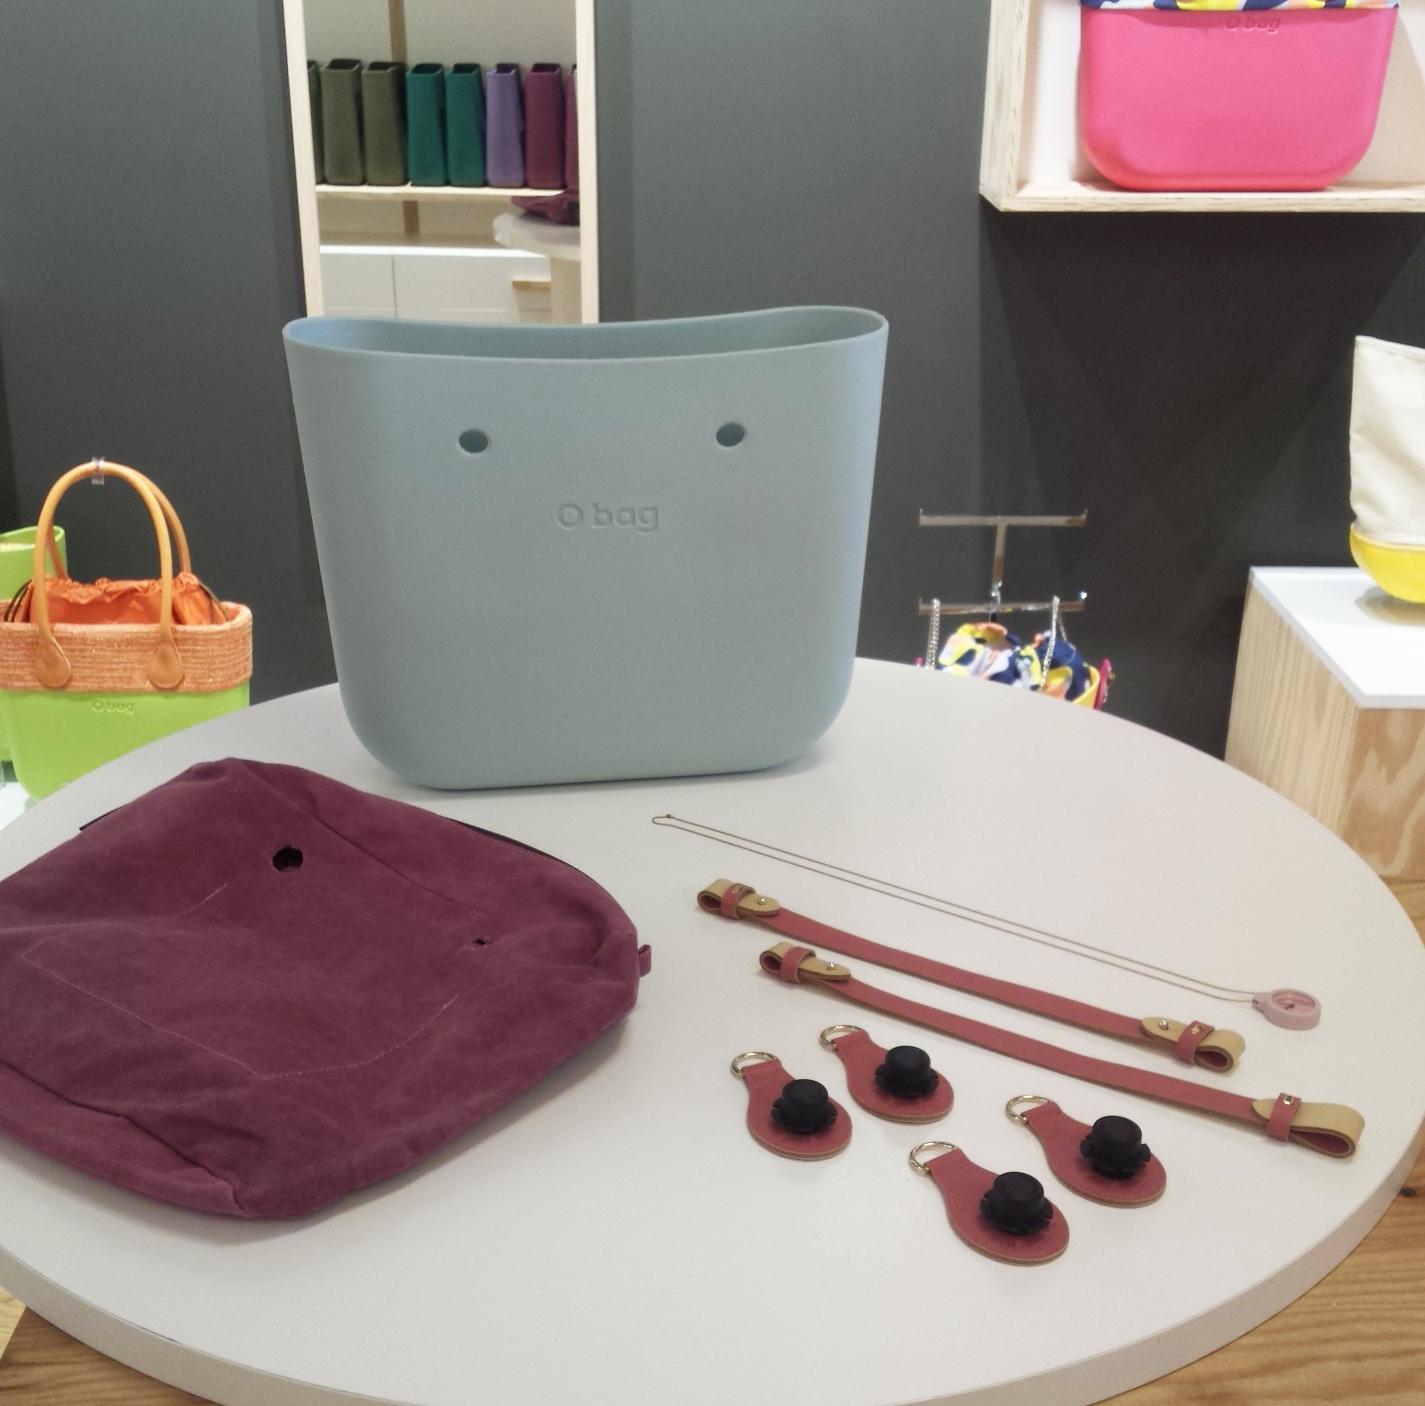 O bag store L'avenue 83